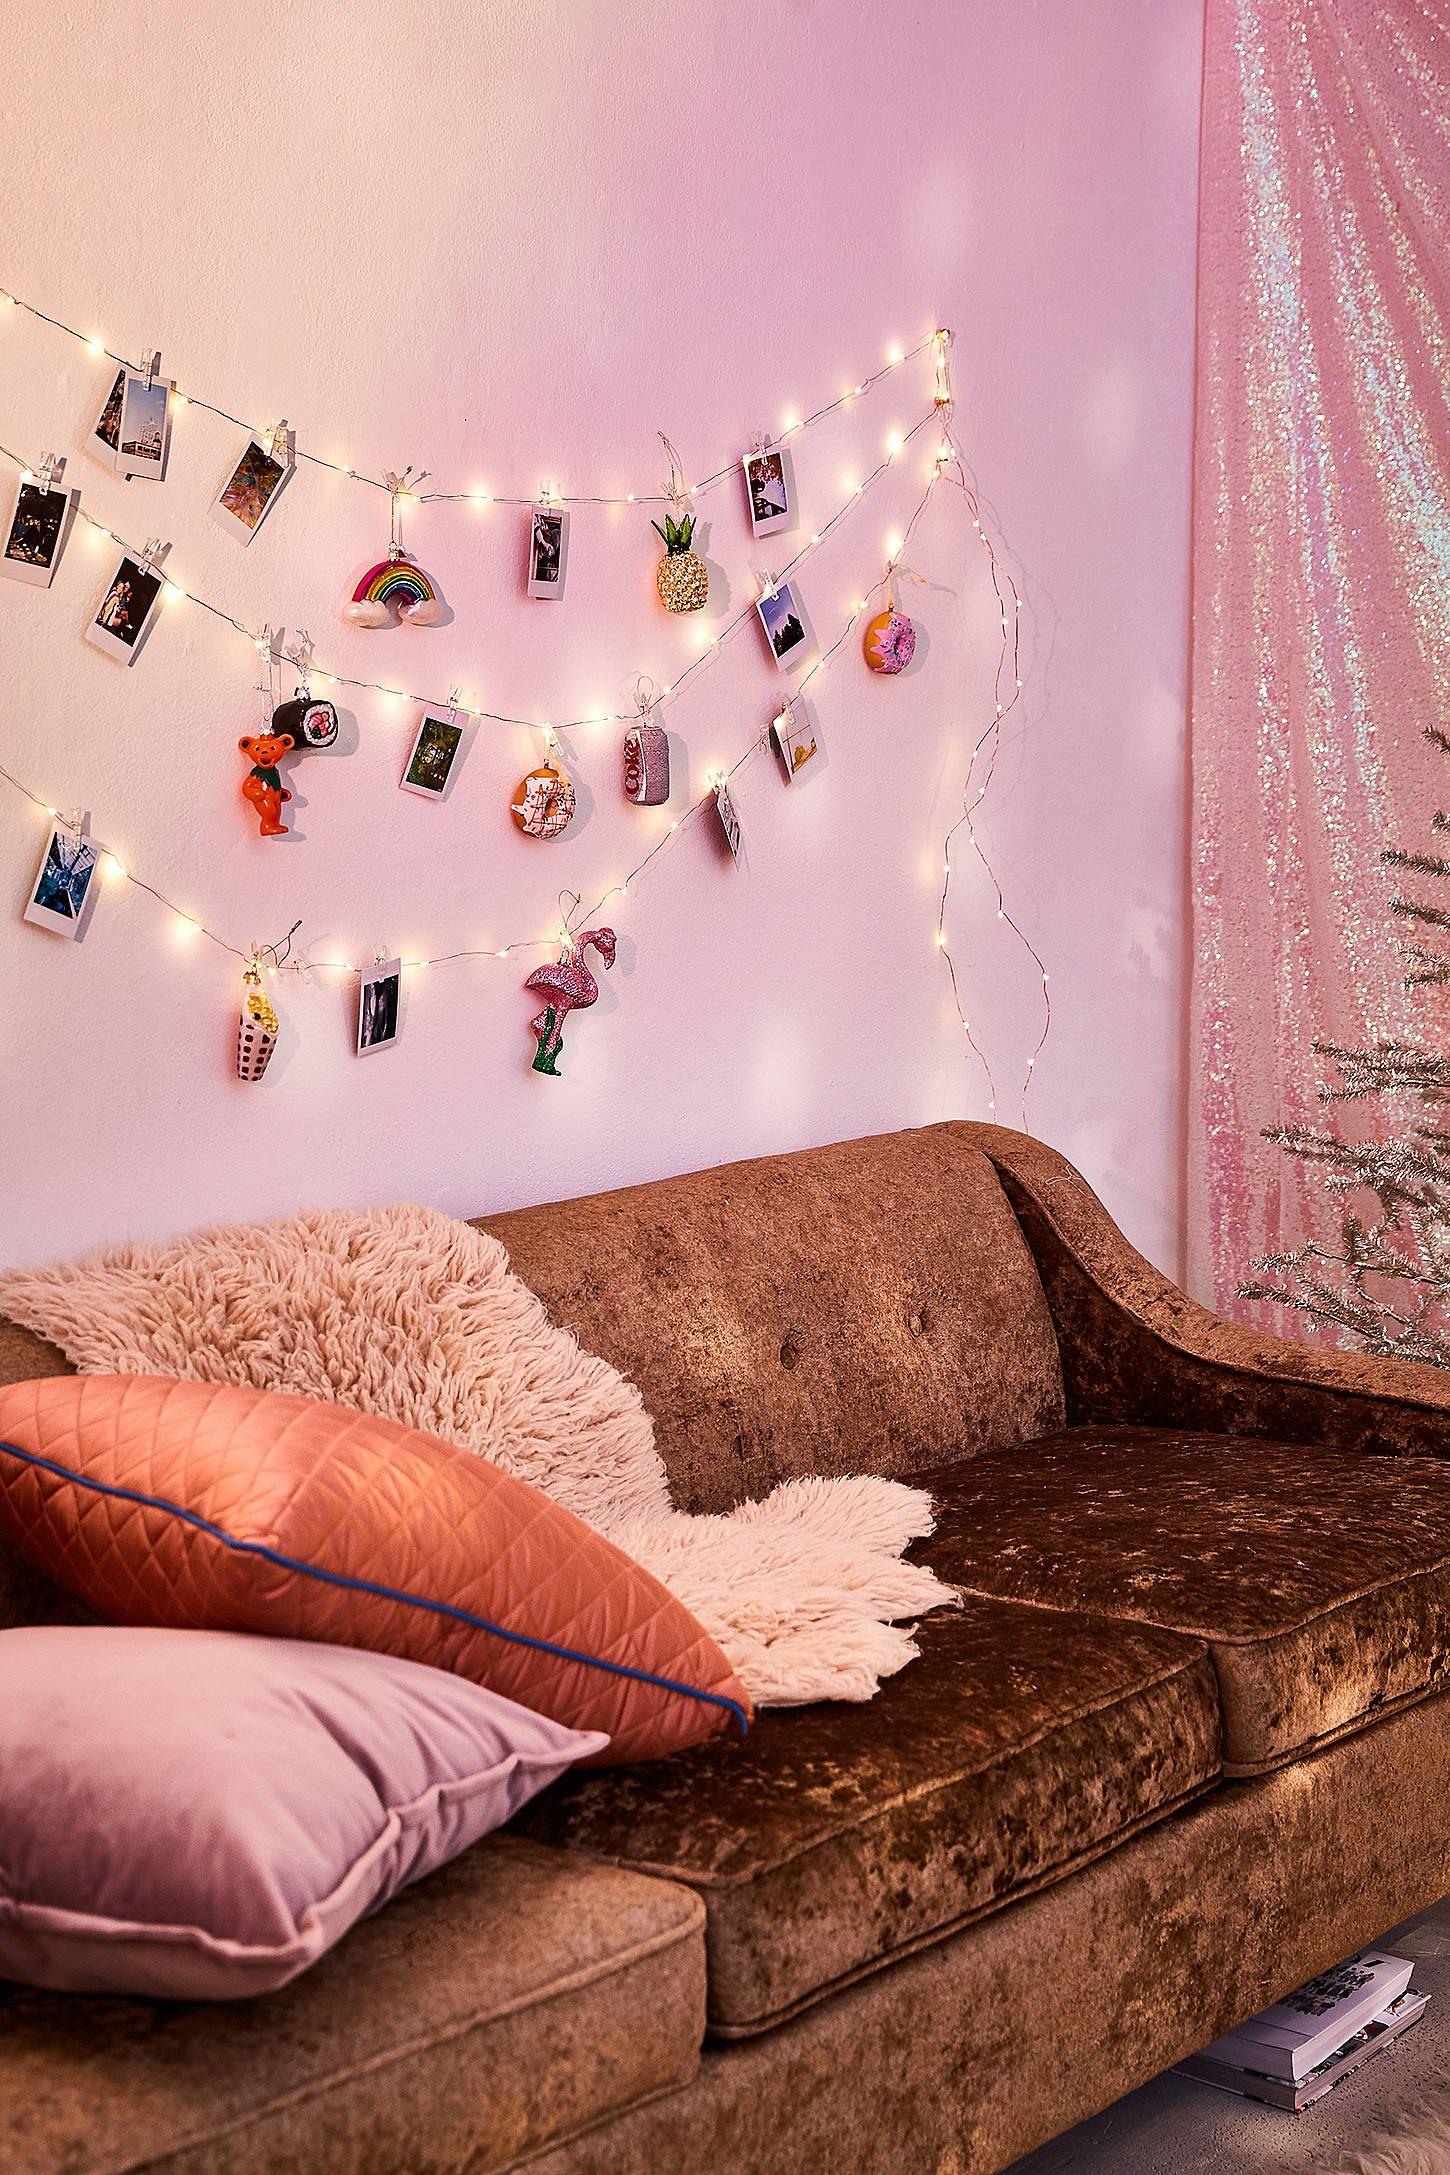 Photo Clip Firefly String Lights | misc || For House | Pinterest ...